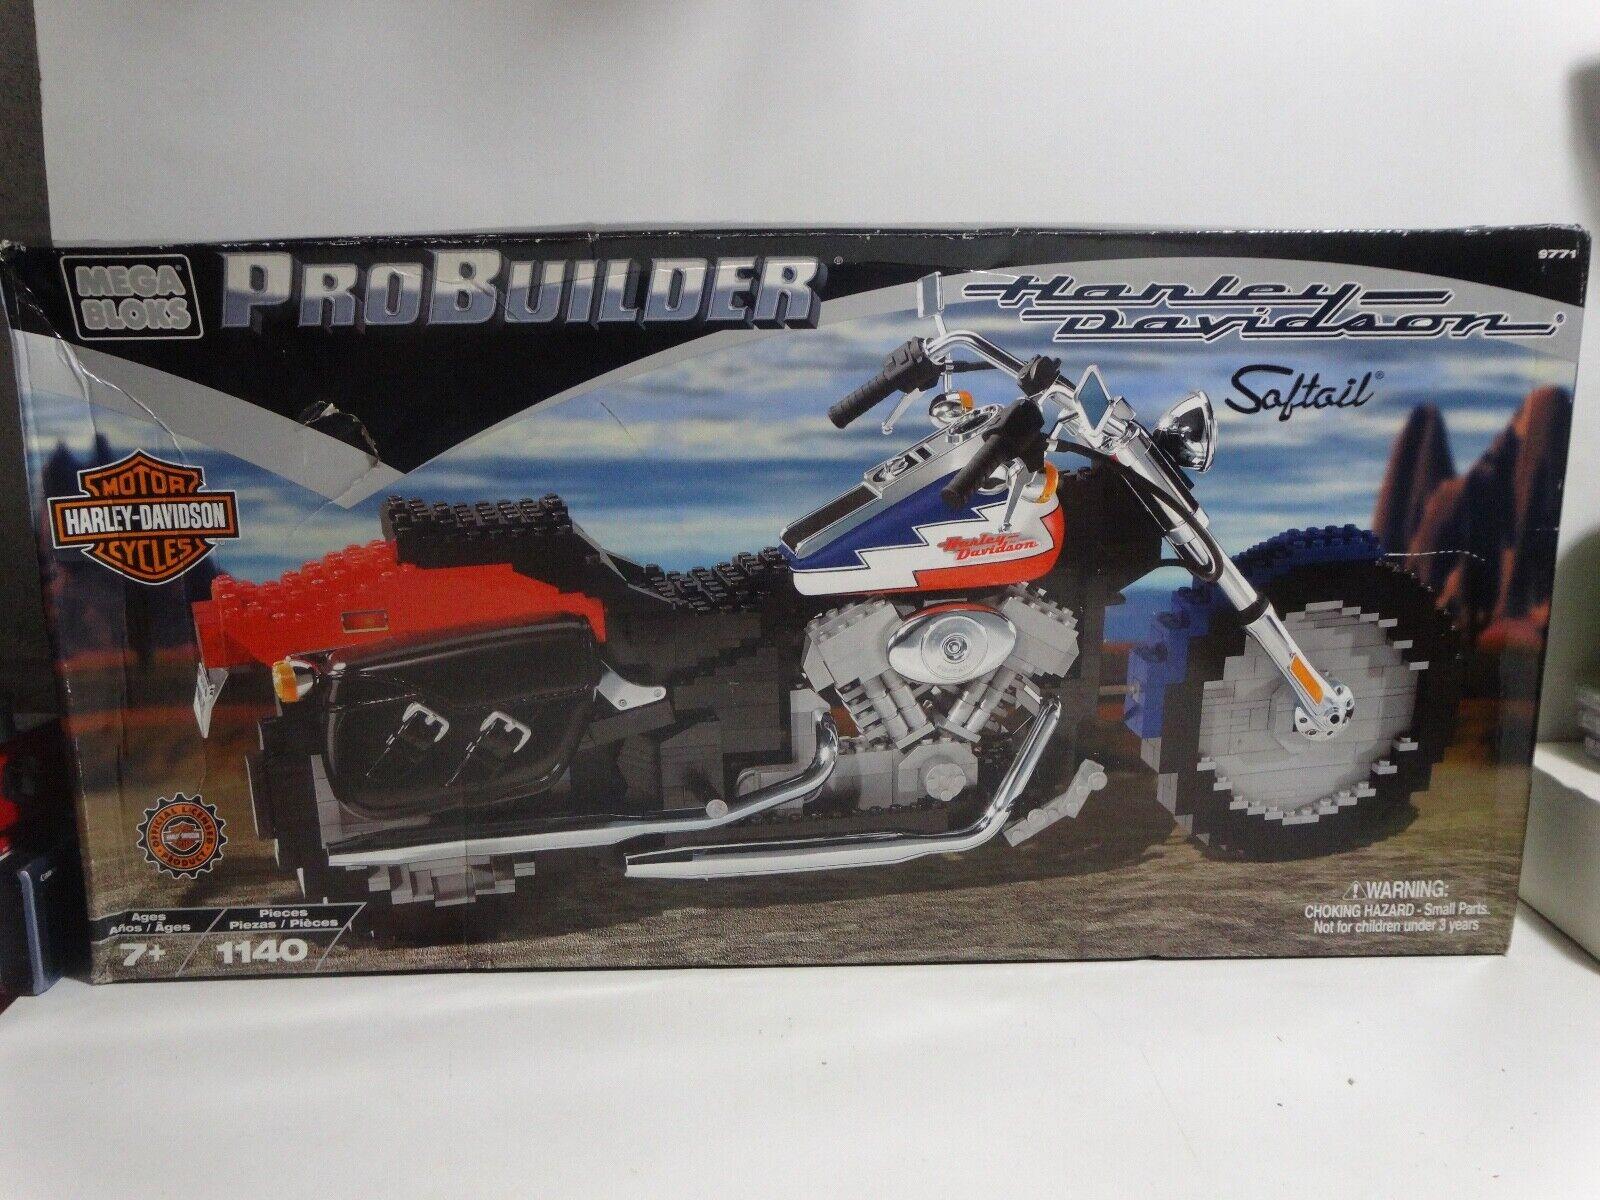 Mega Bloks 9771 ProBuilder 2001 Harley Davidson Softail Motorcycle 1140 pcs.